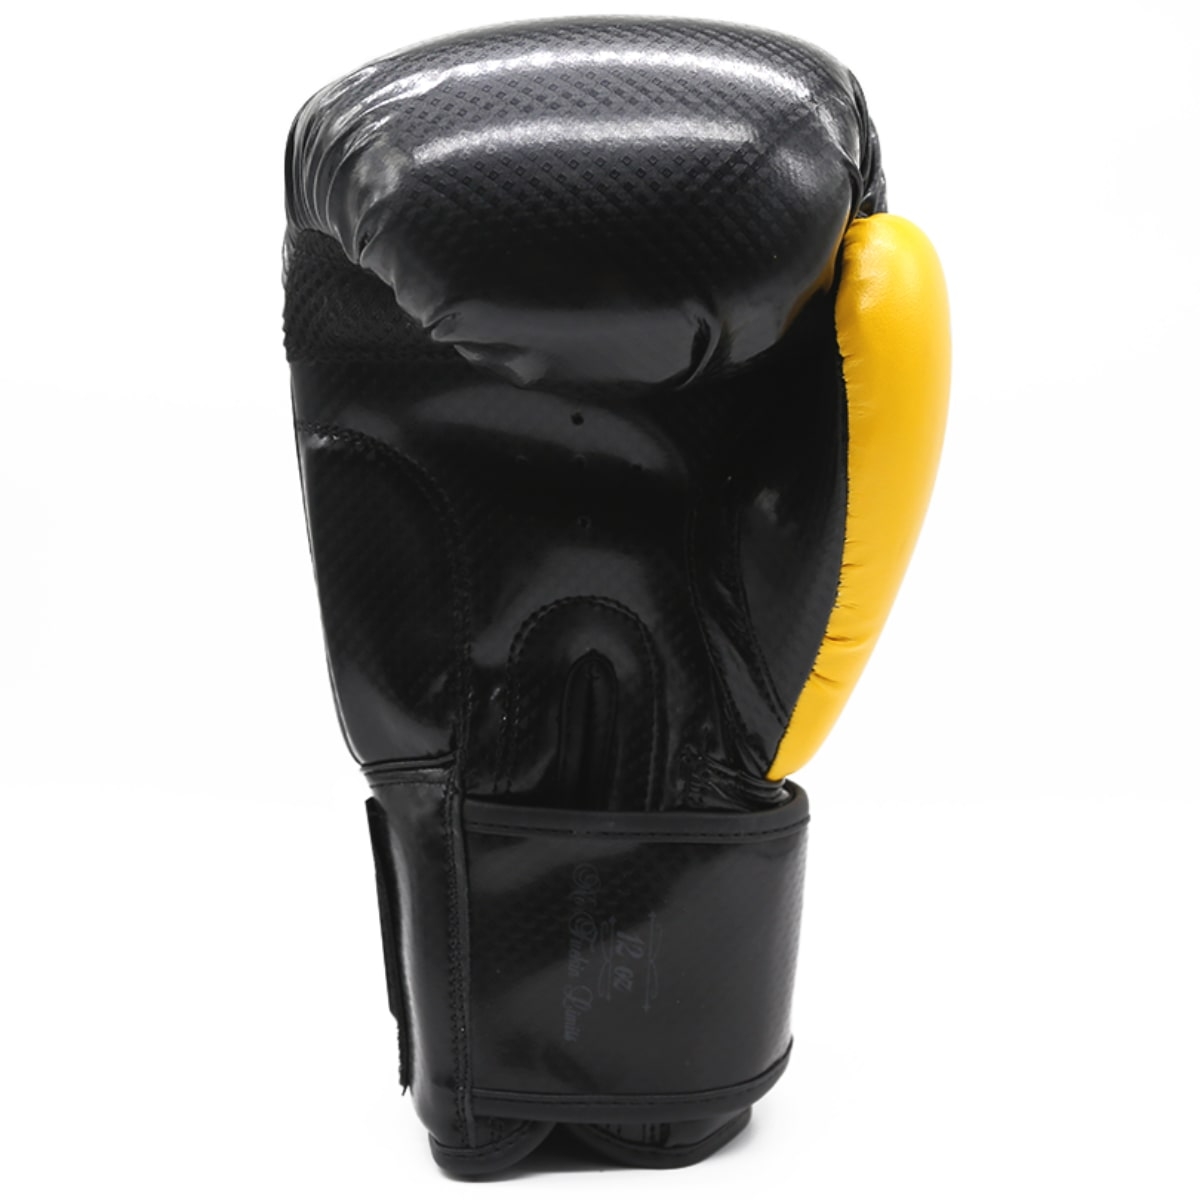 Luva de Boxe Pretorian Black Line - Preto e Amarelo